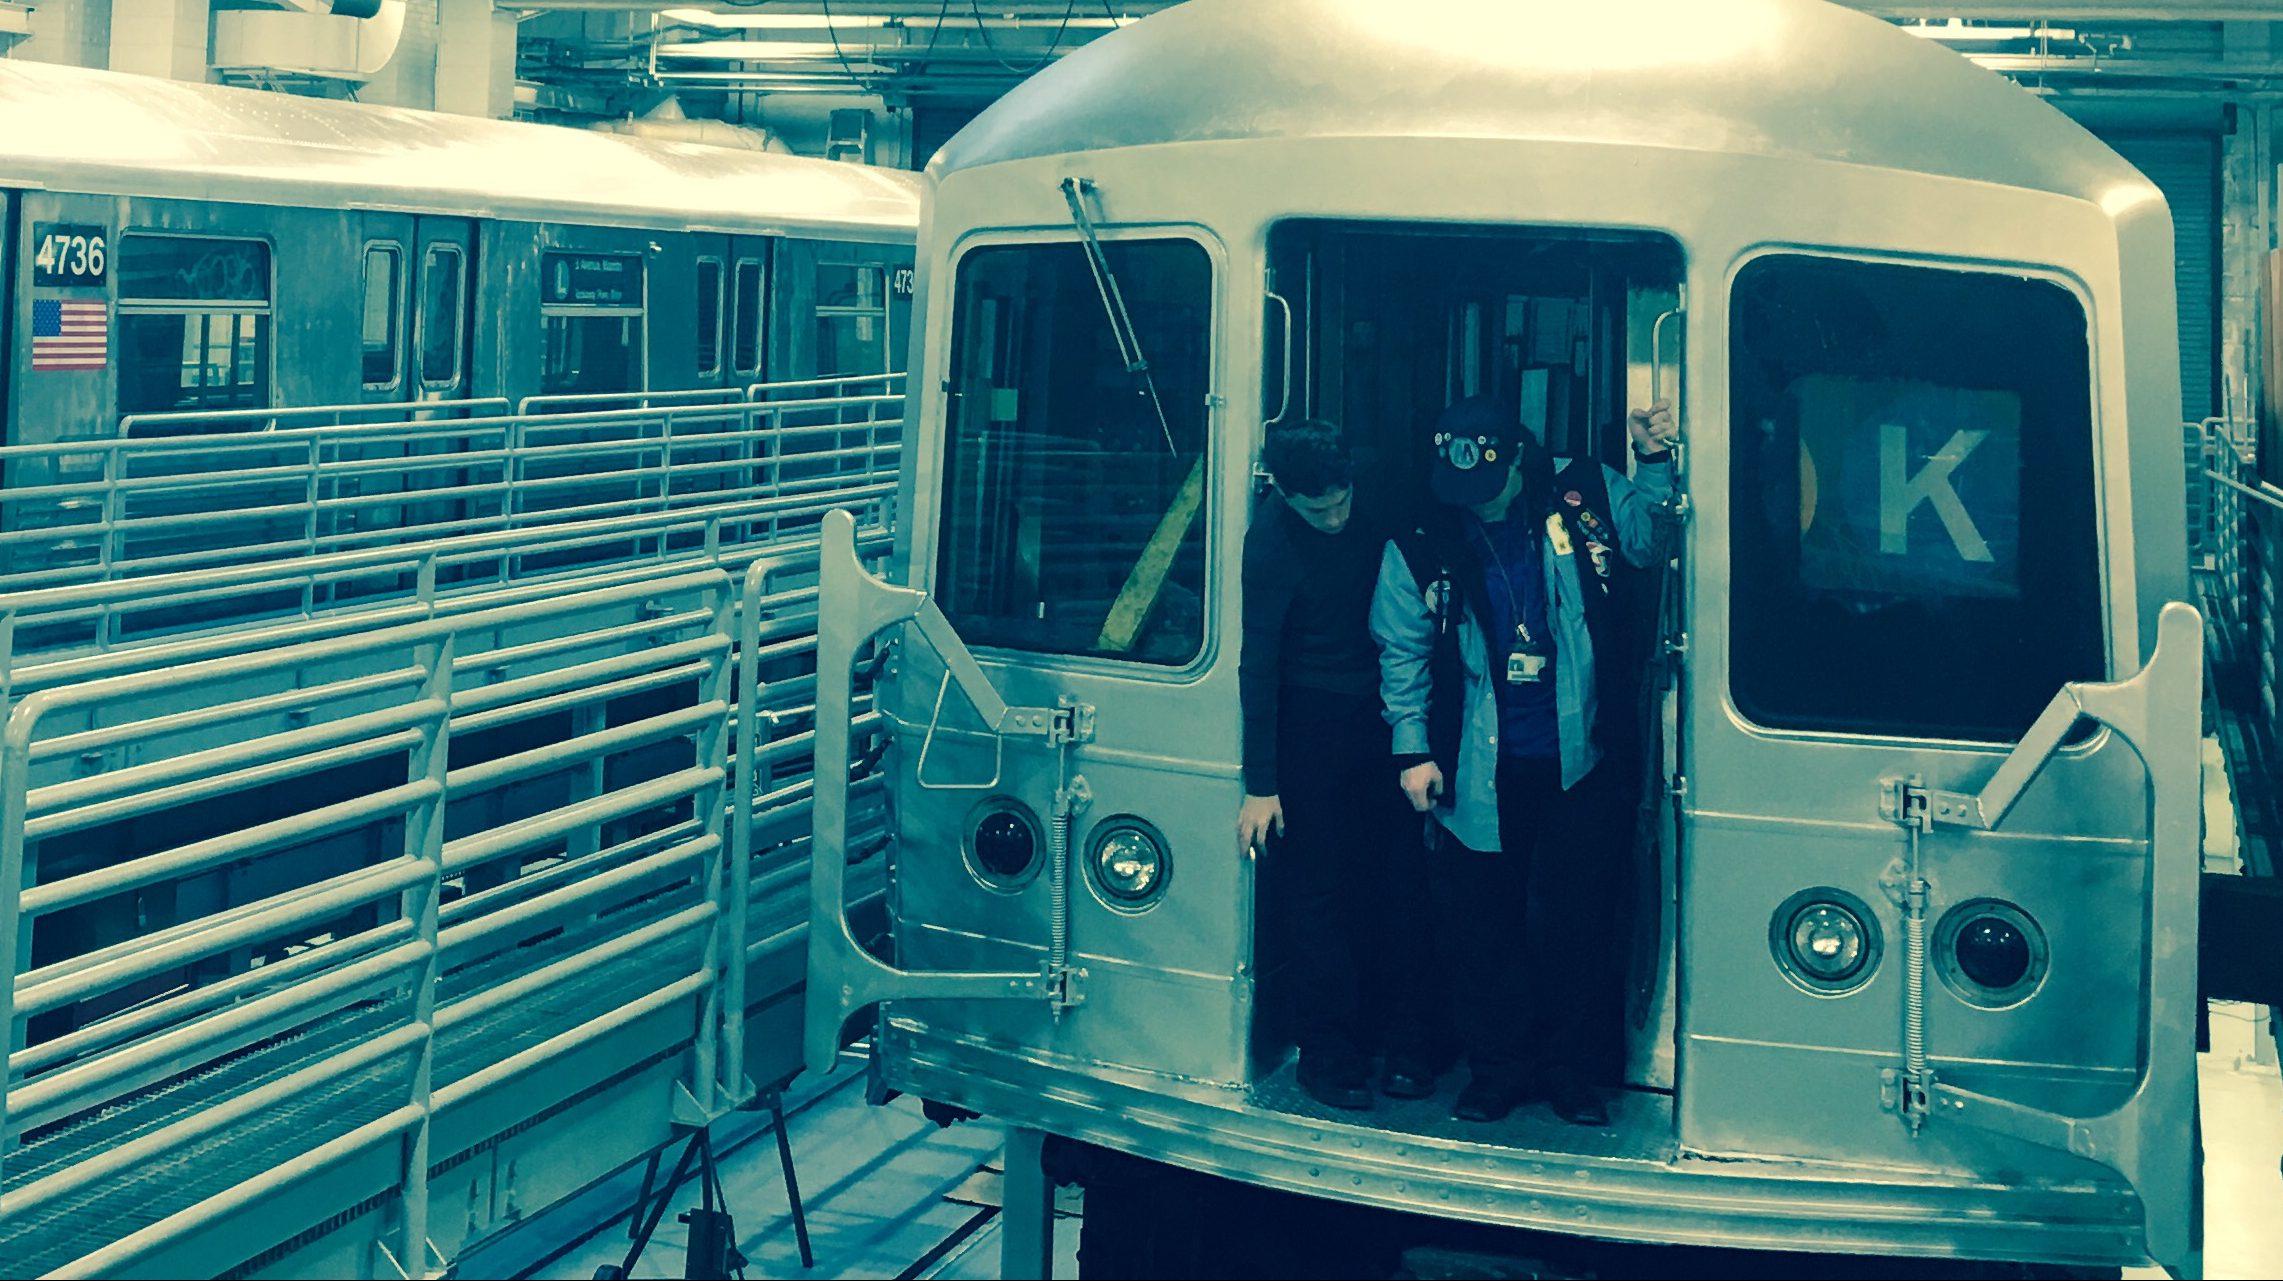 train car lab photo